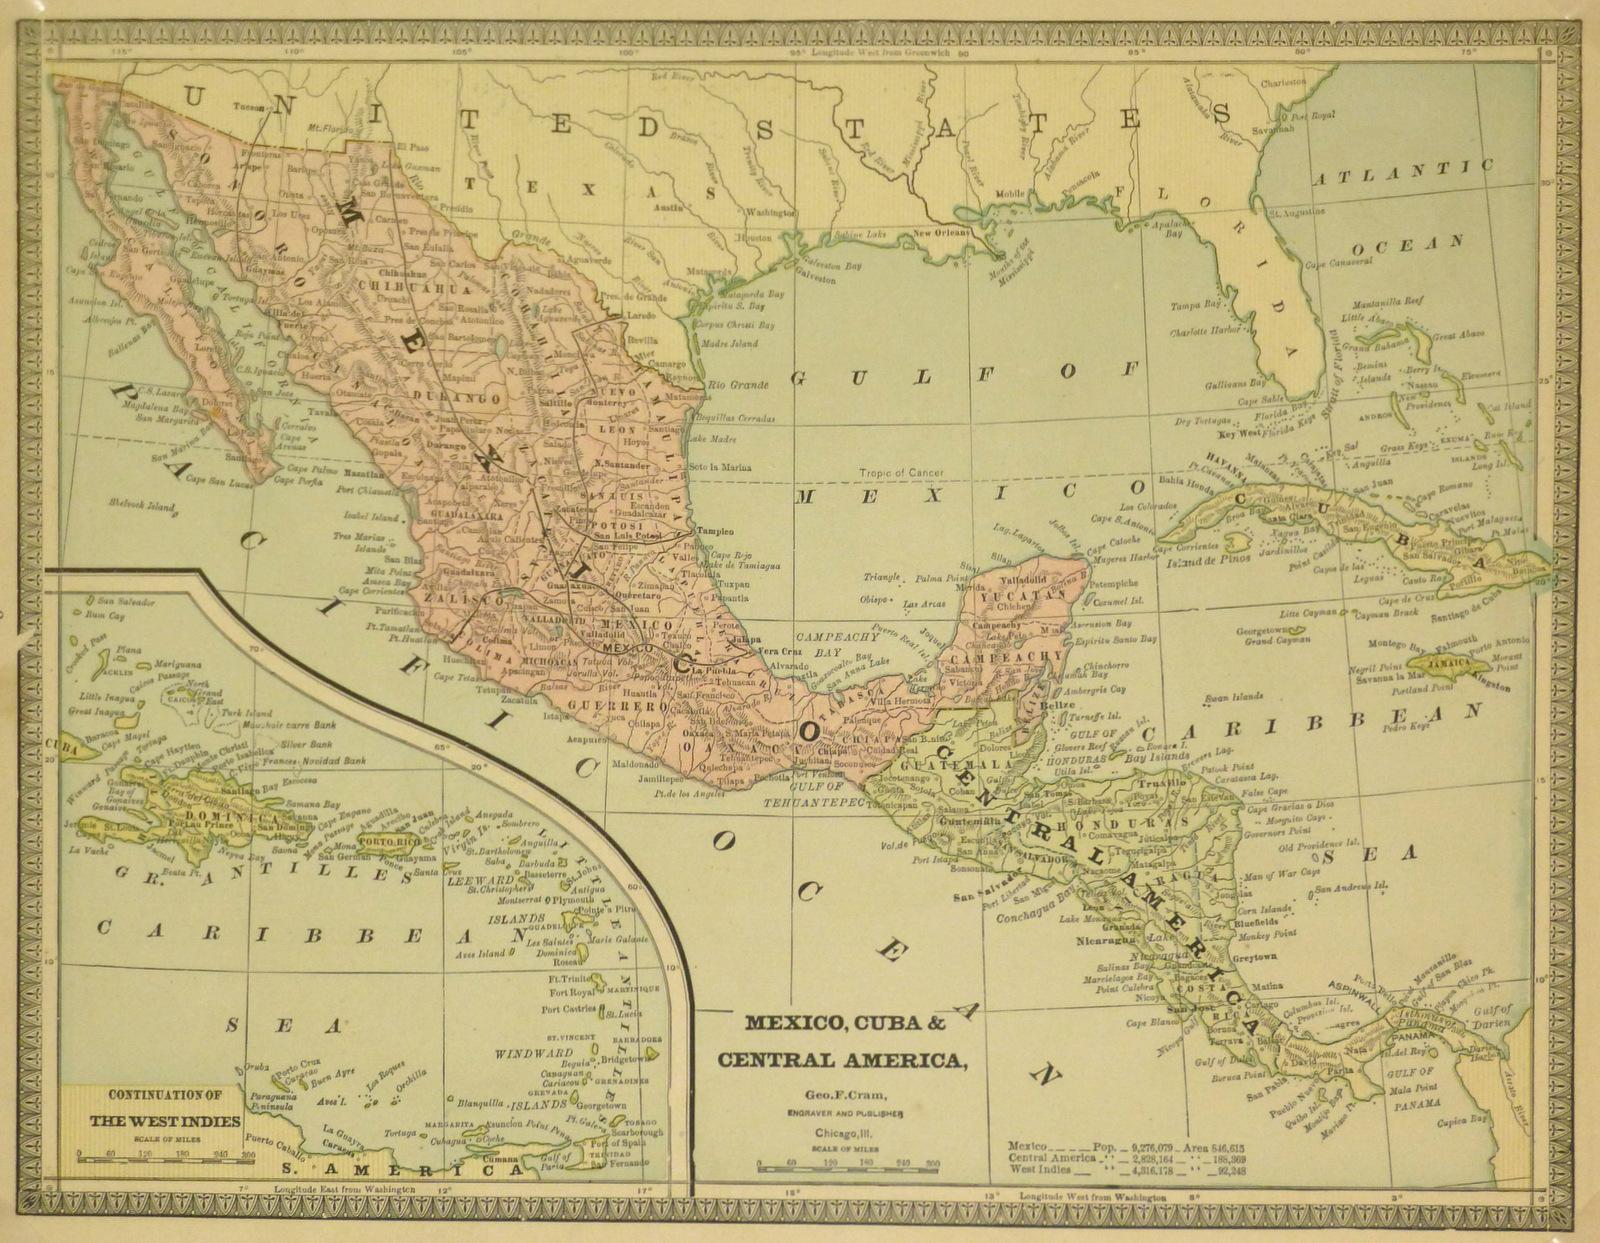 Mexico, Cuba & Central America Map, 1890-main-8202K